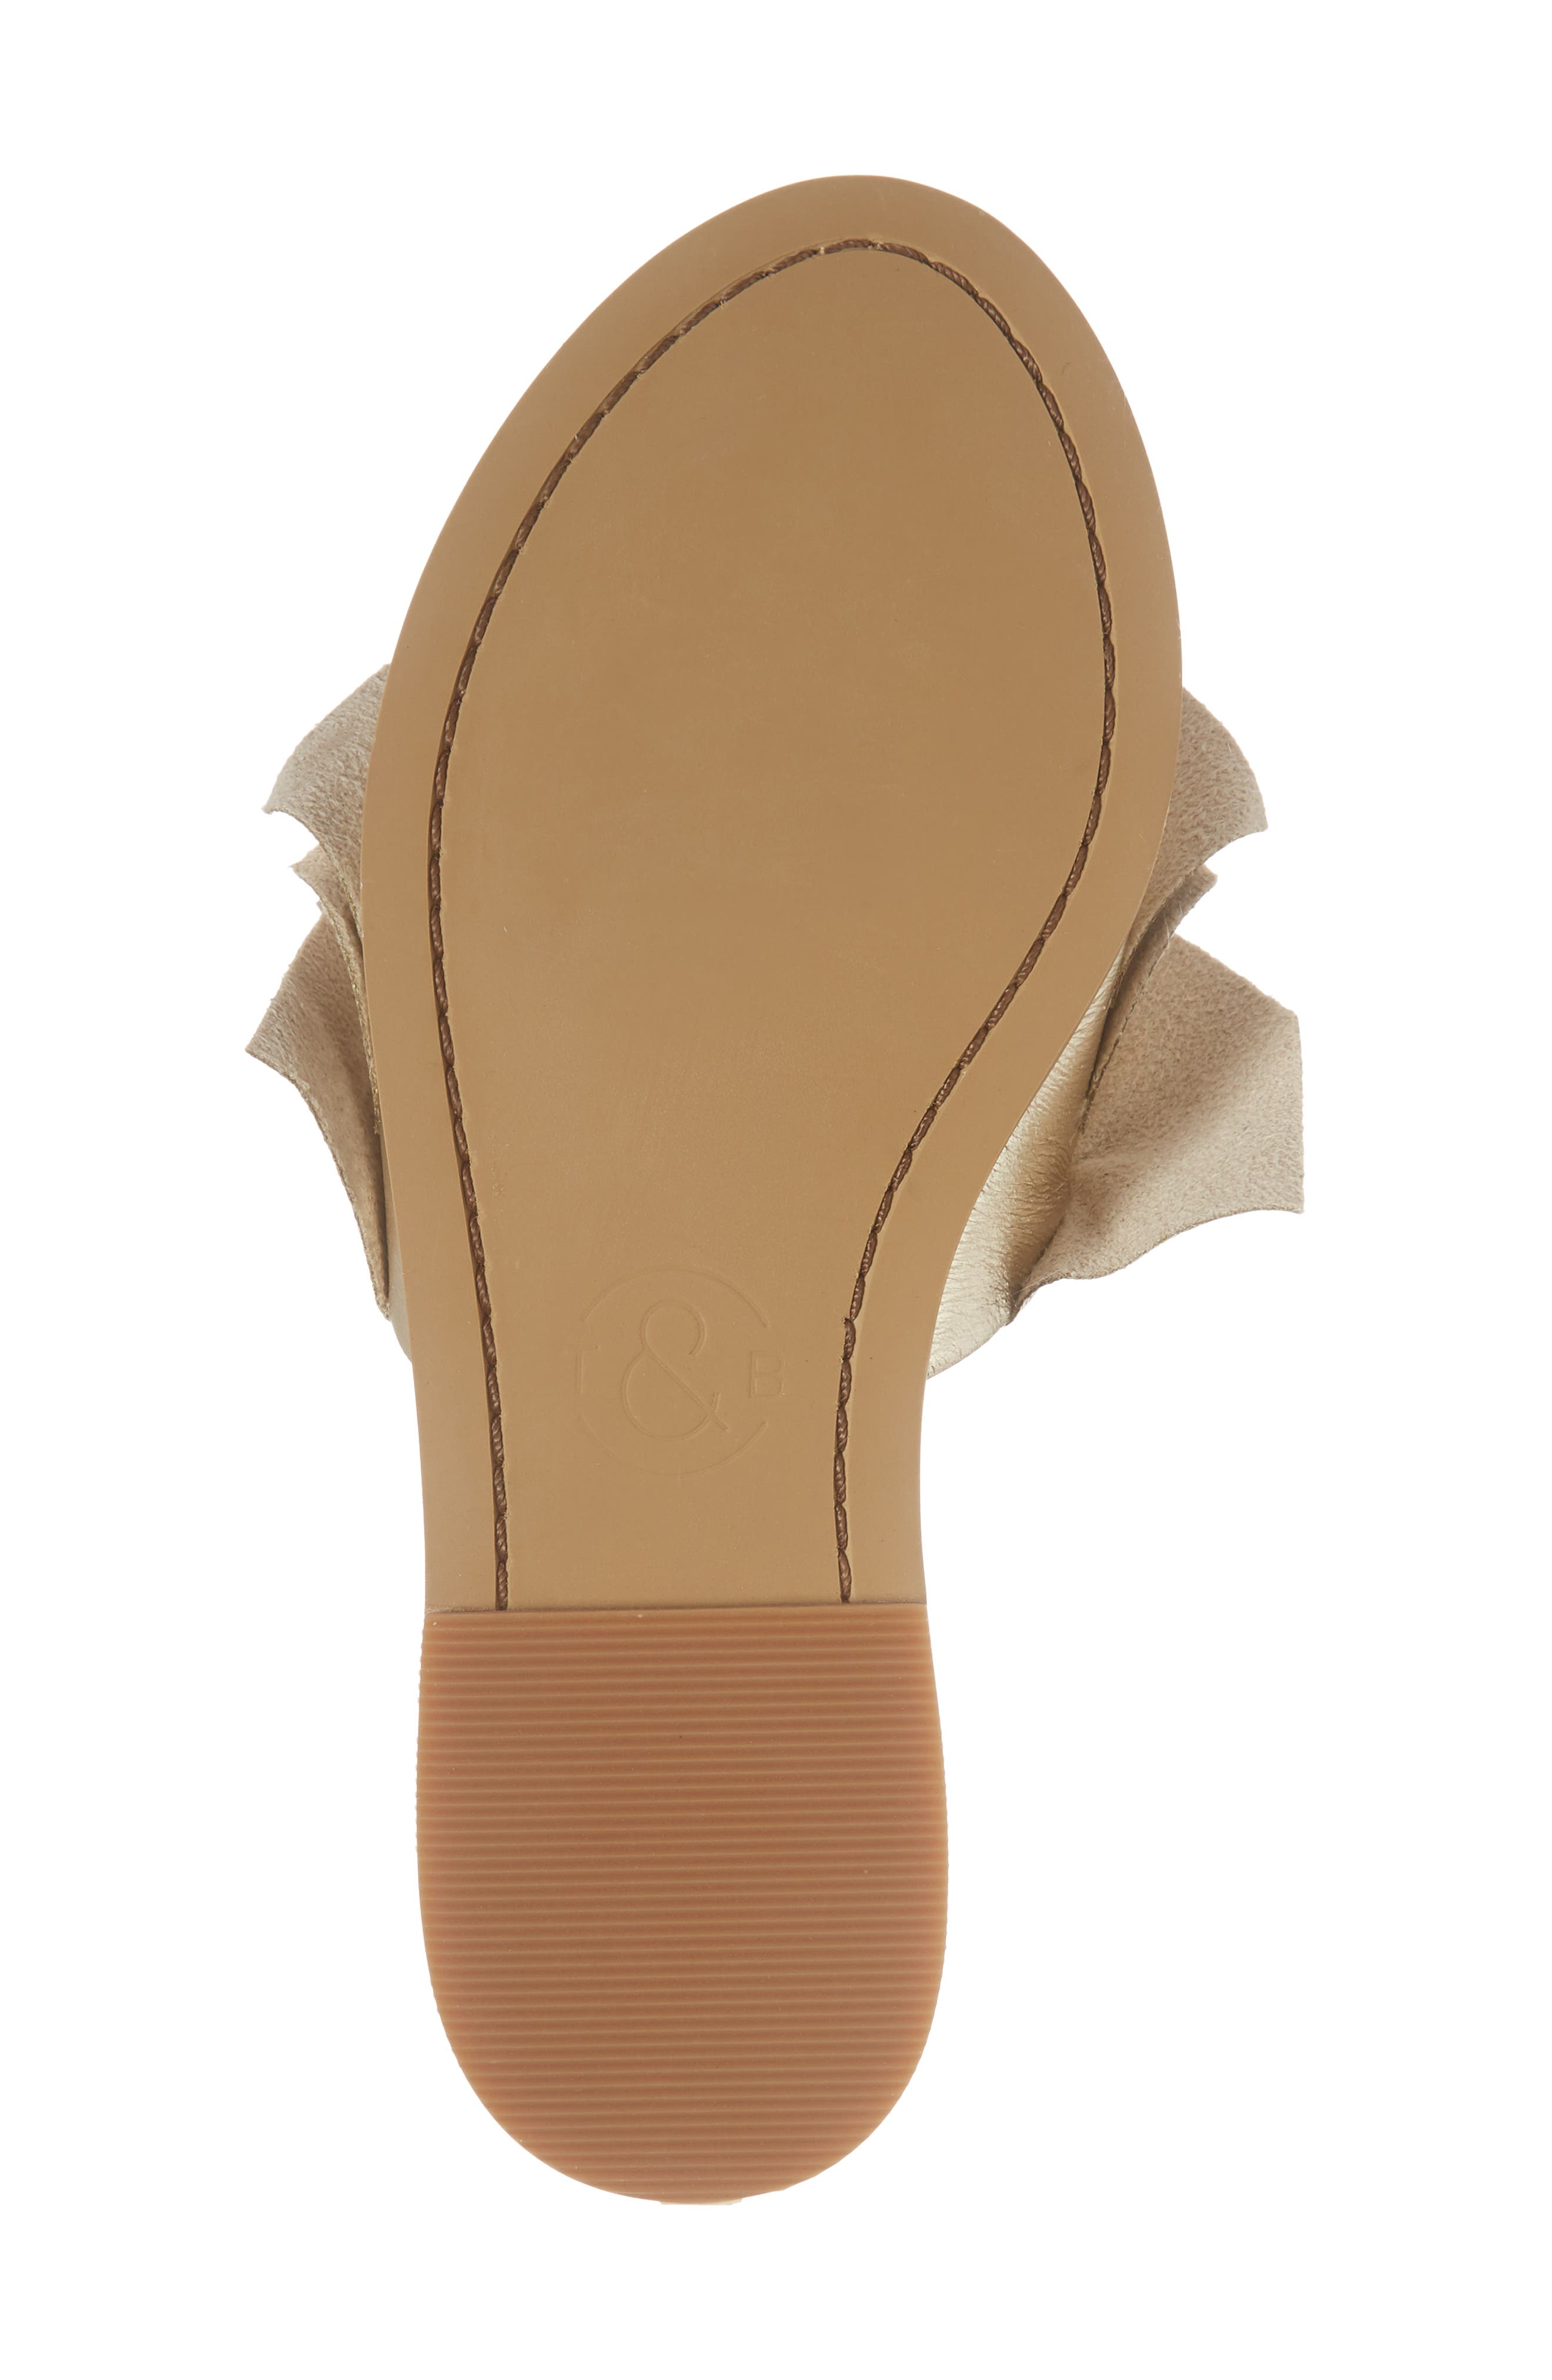 Ruby Ruffled Slide Sandal,                             Alternate thumbnail 6, color,                             Gold Crackle Faux Leather